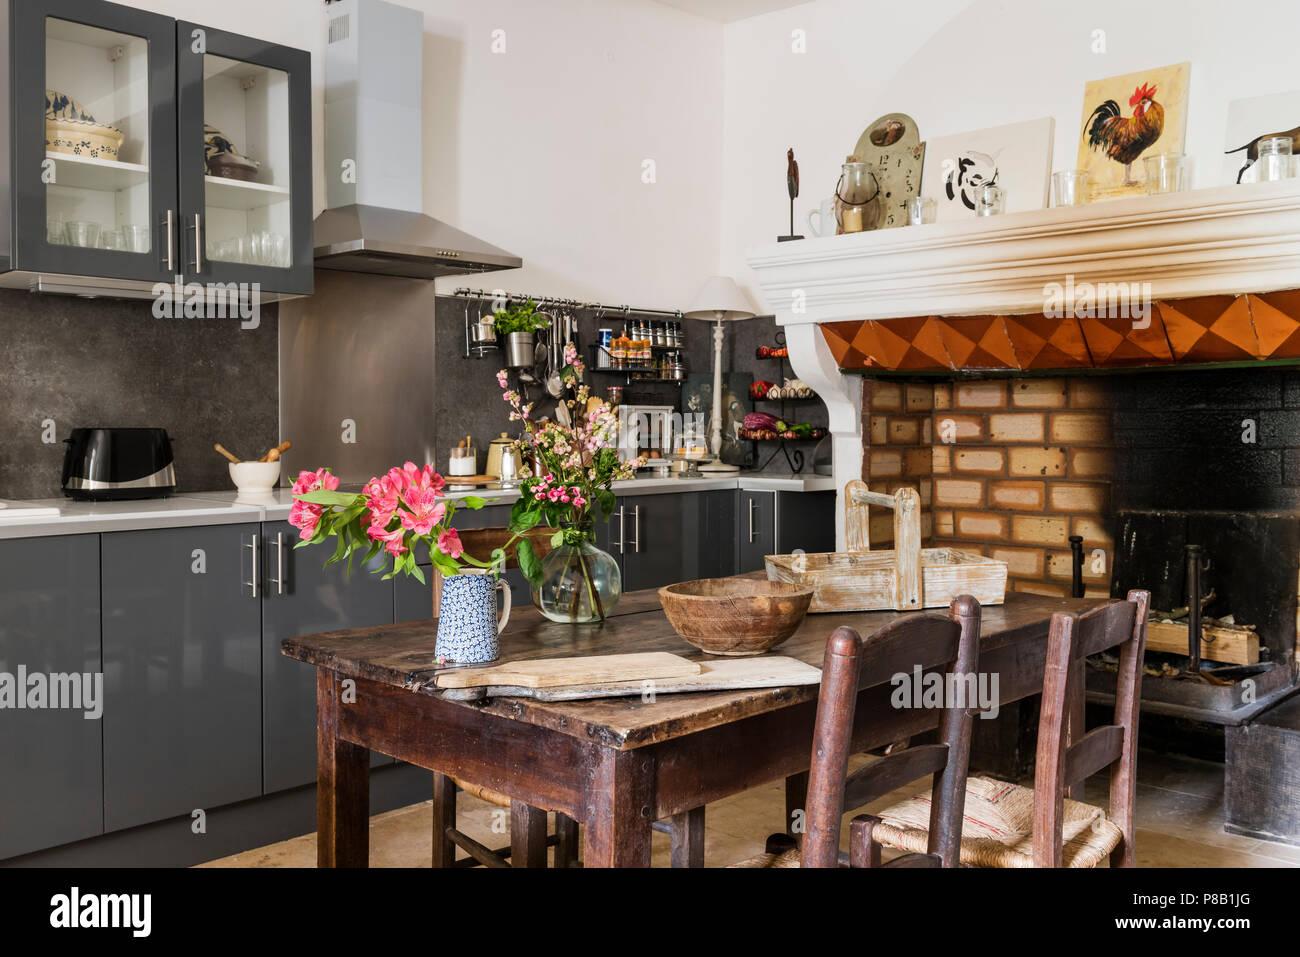 Cucina Moderna Con Tavolo Antico.Cucina Moderna Con Antico Camino Trattenuto Xix Secolo